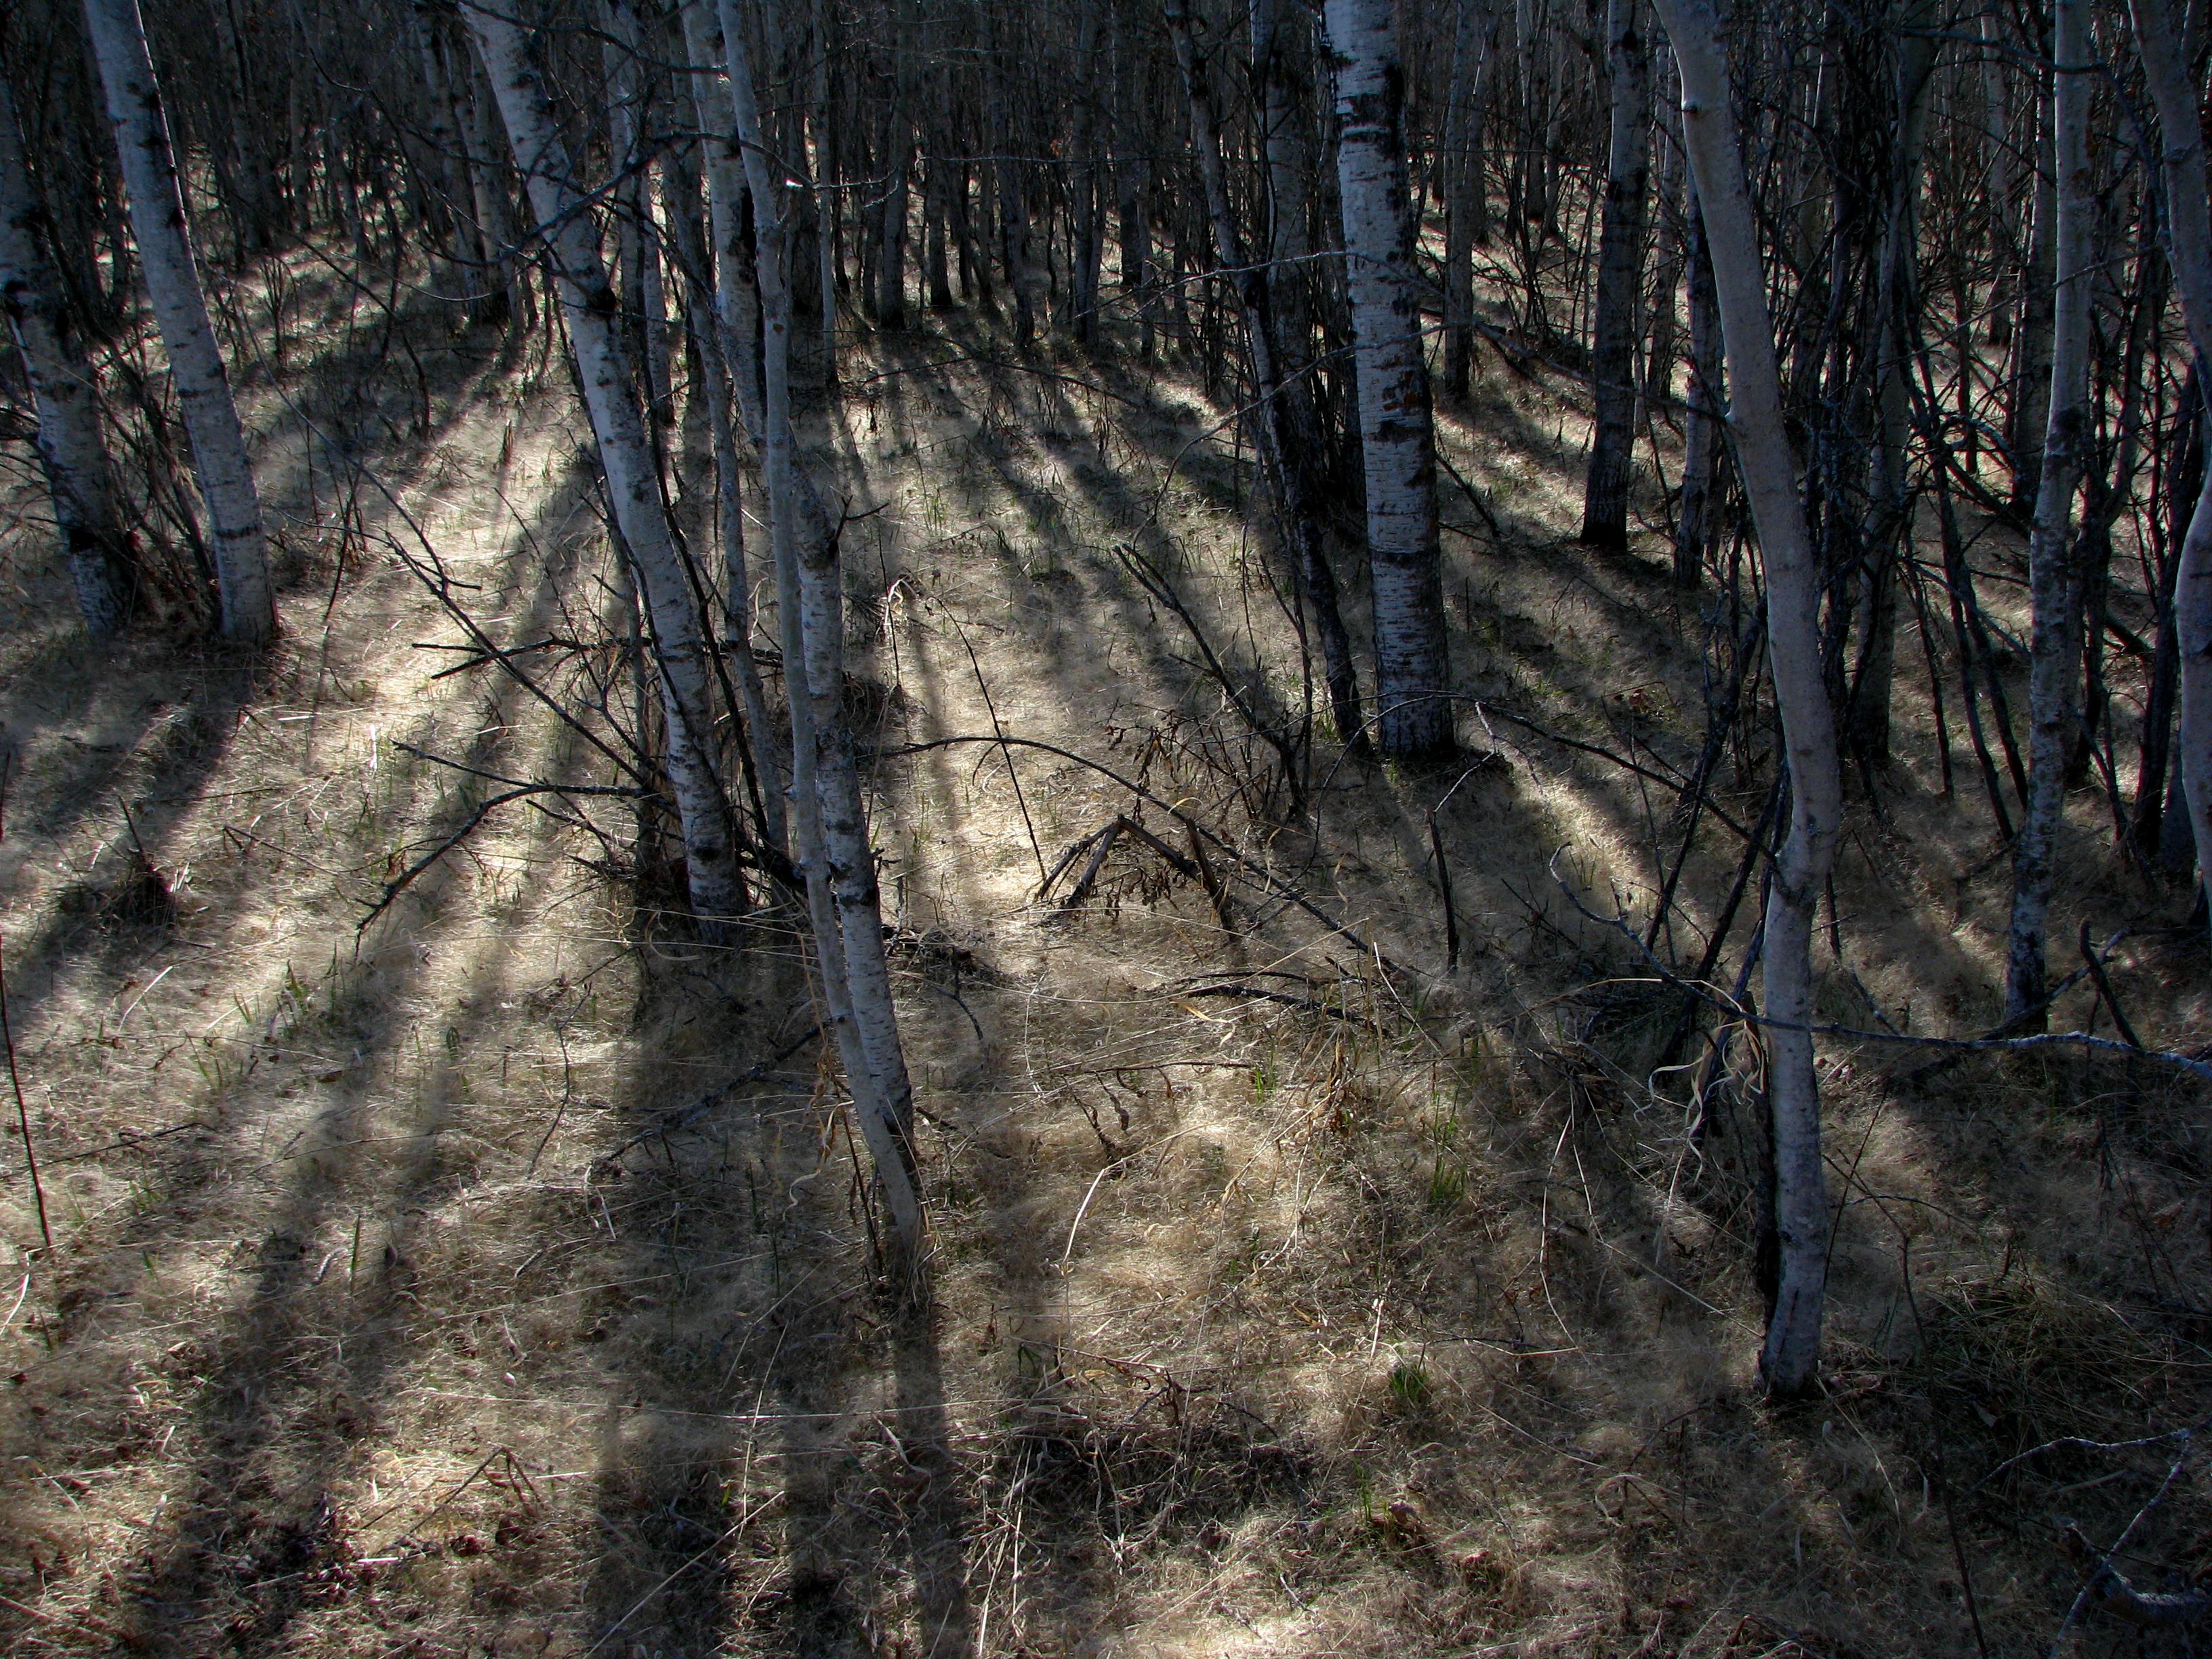 File:Grass Seed Carpet (3496305742) jpg - Wikimedia Commons